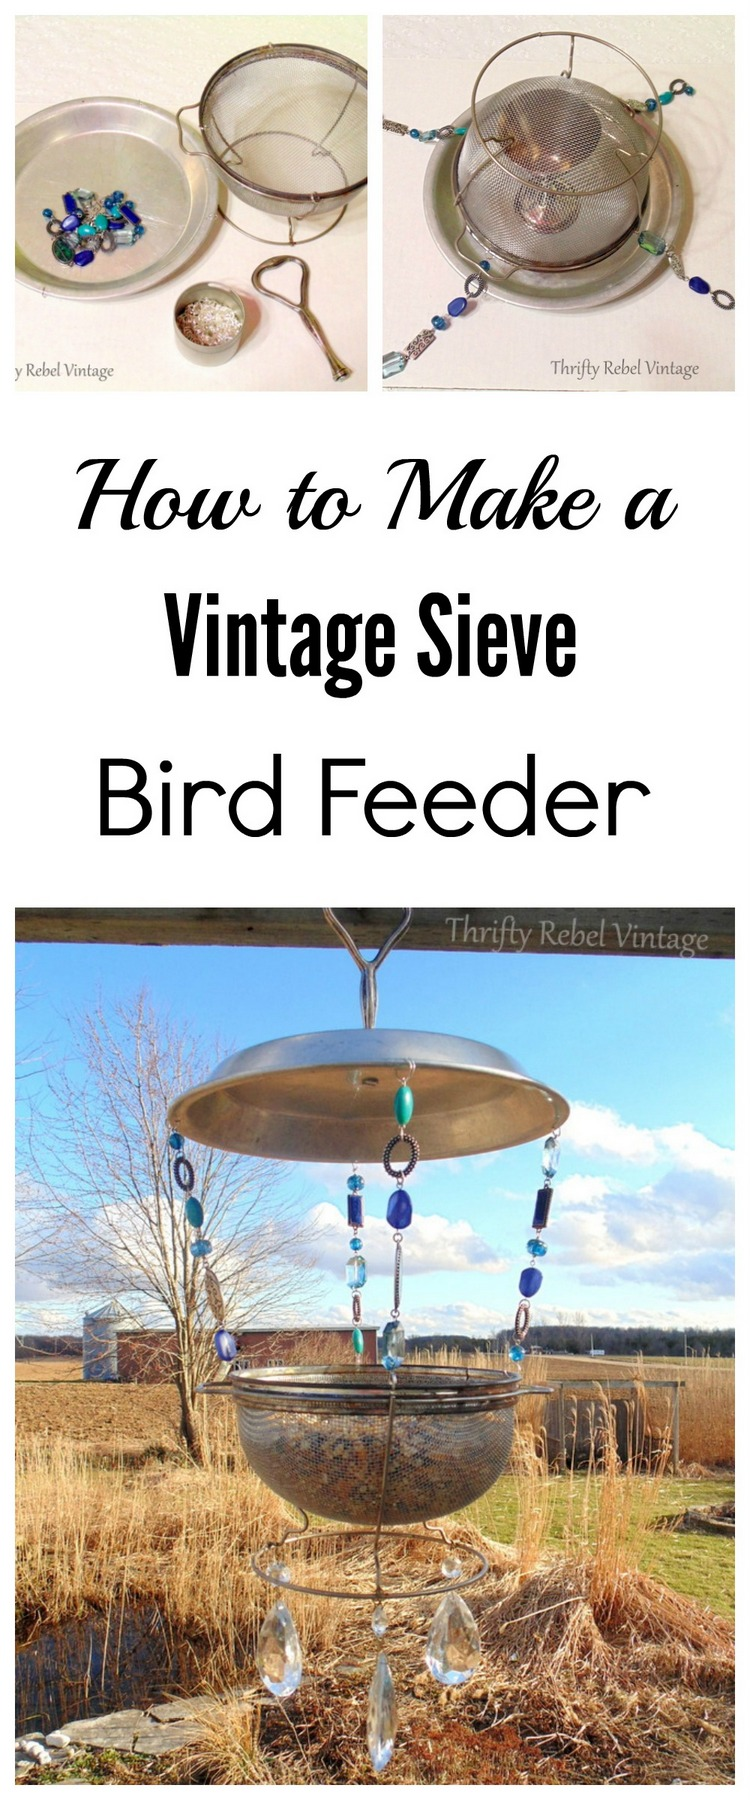 How to make a repurposed vintage sieve bird feeder